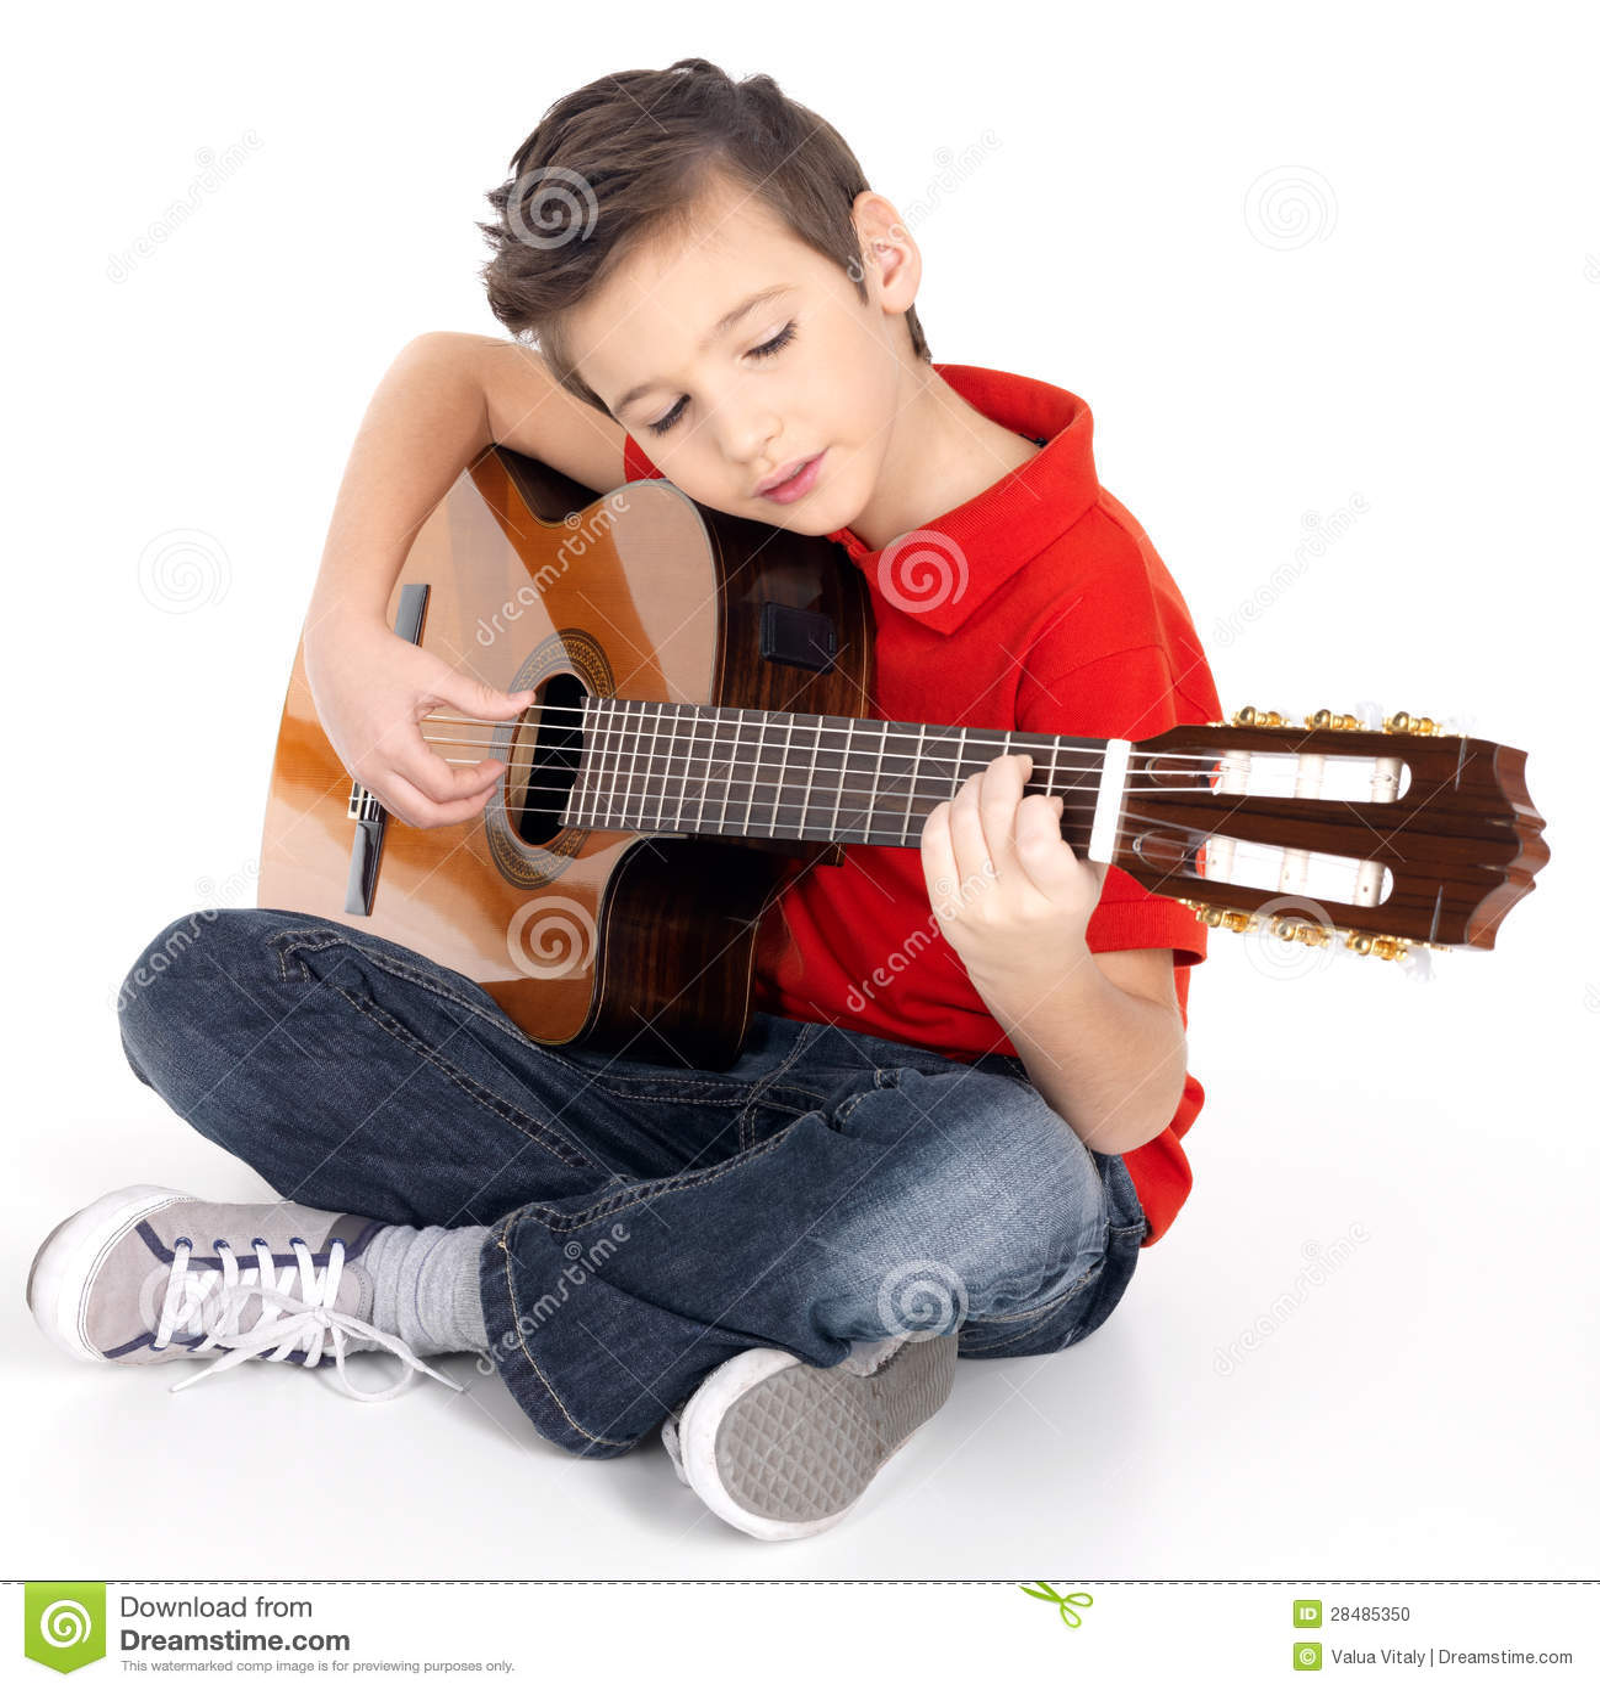 El escolar está tocando la guitarra acústica